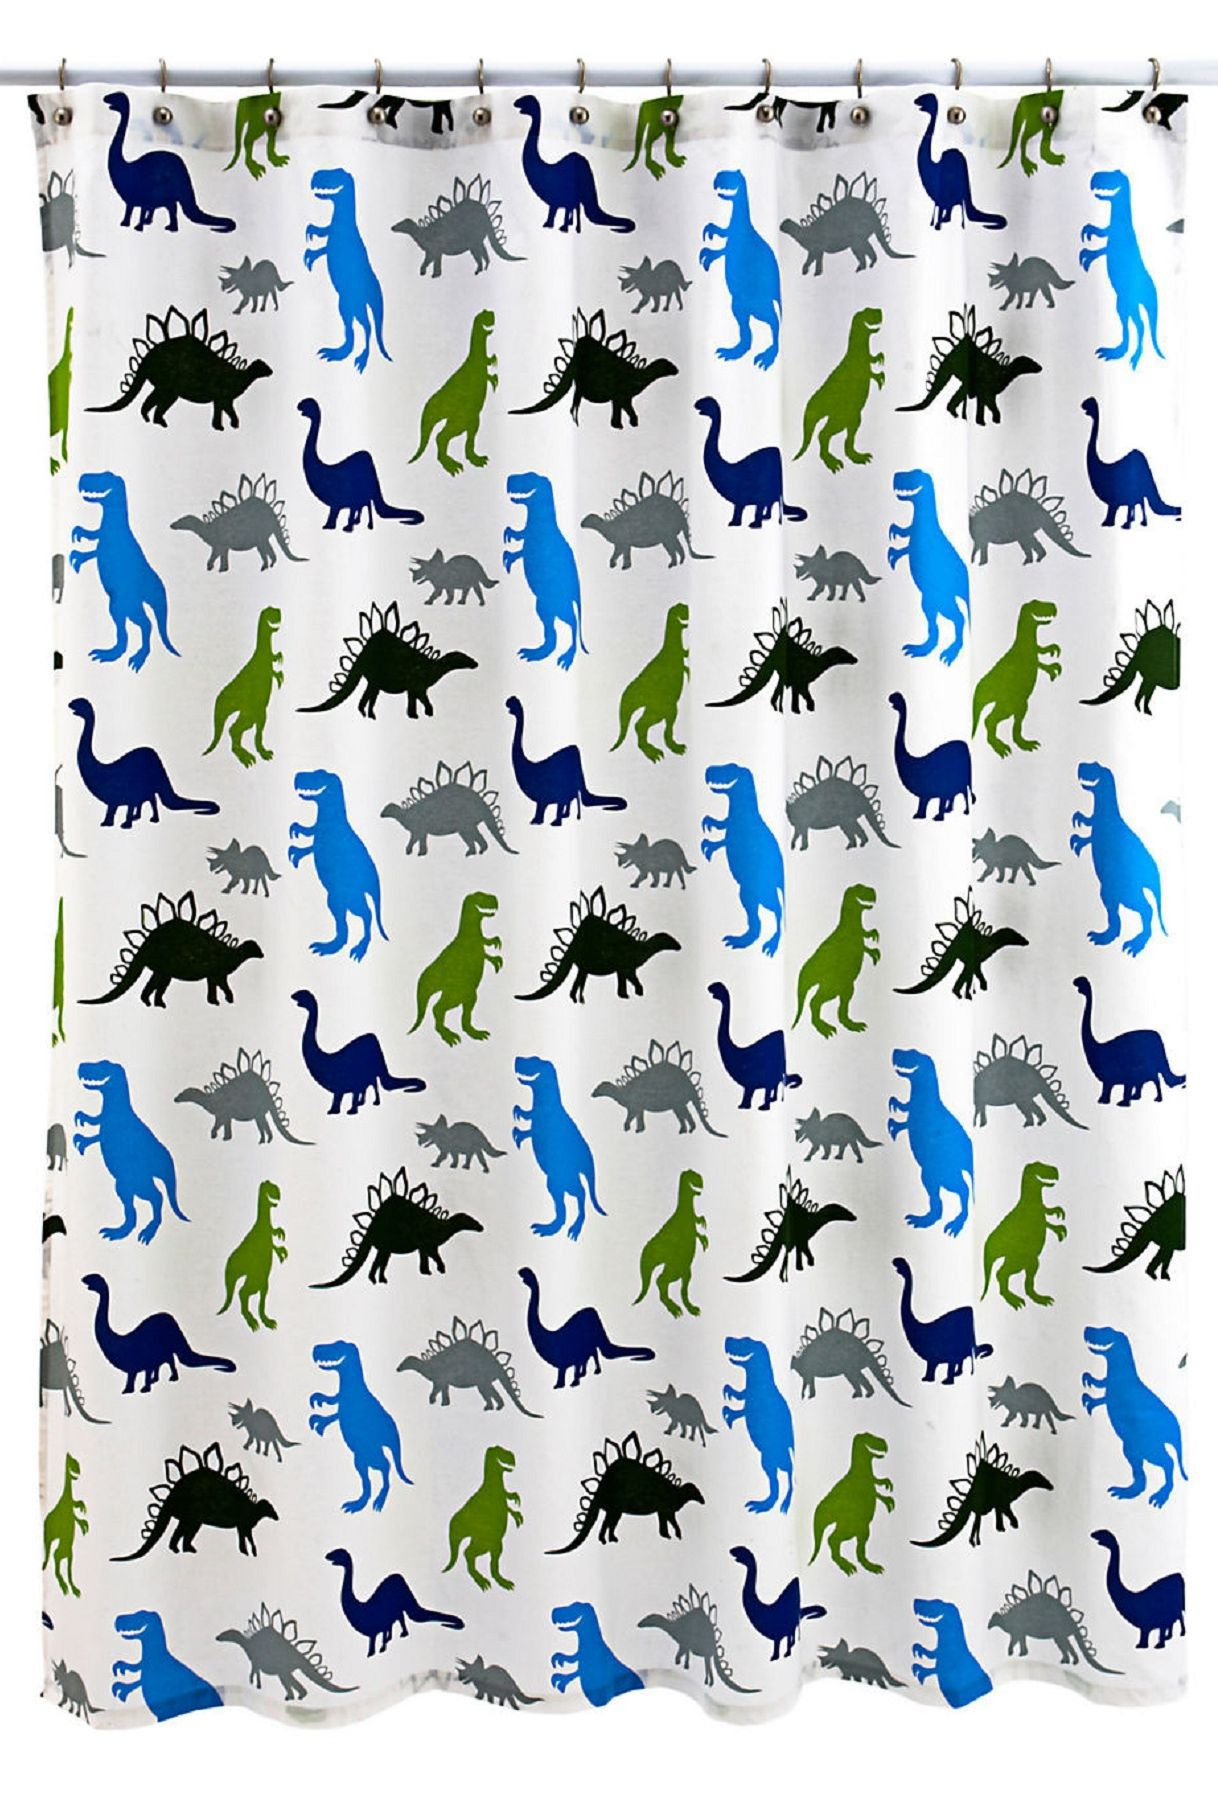 Шторки для ванной Элитная шторка для ванной детская Dino Park от Kassatex elitnaya-shtorka-dlya-vannoy-dino-park-ot-kassatex-ssha-kitay.jpg